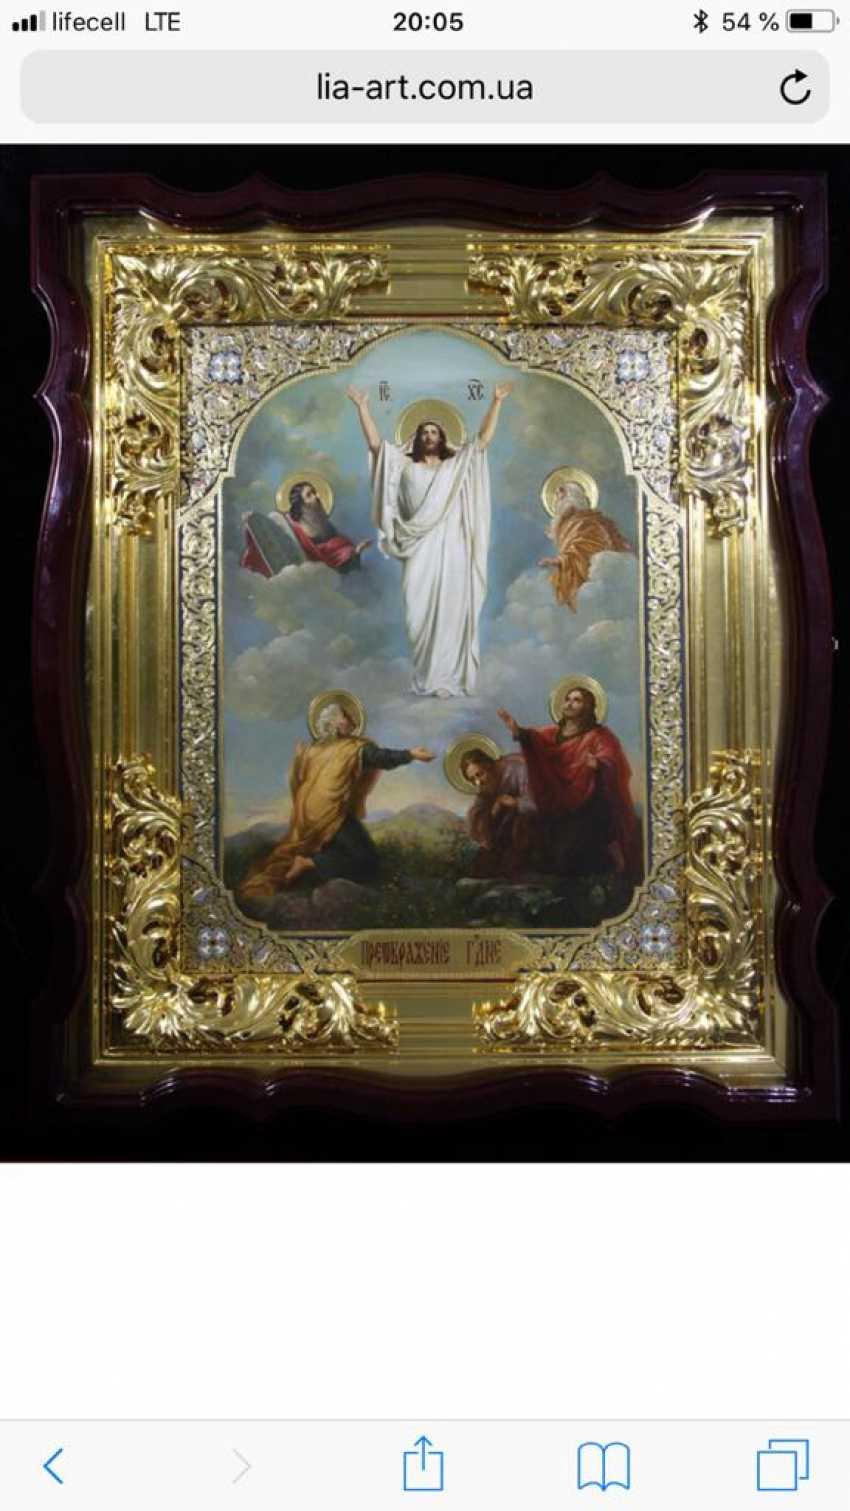 Lilia Kovalenko. Saints Boris and Gleb, the last supper, the Transfiguration, the Nativity - photo 3